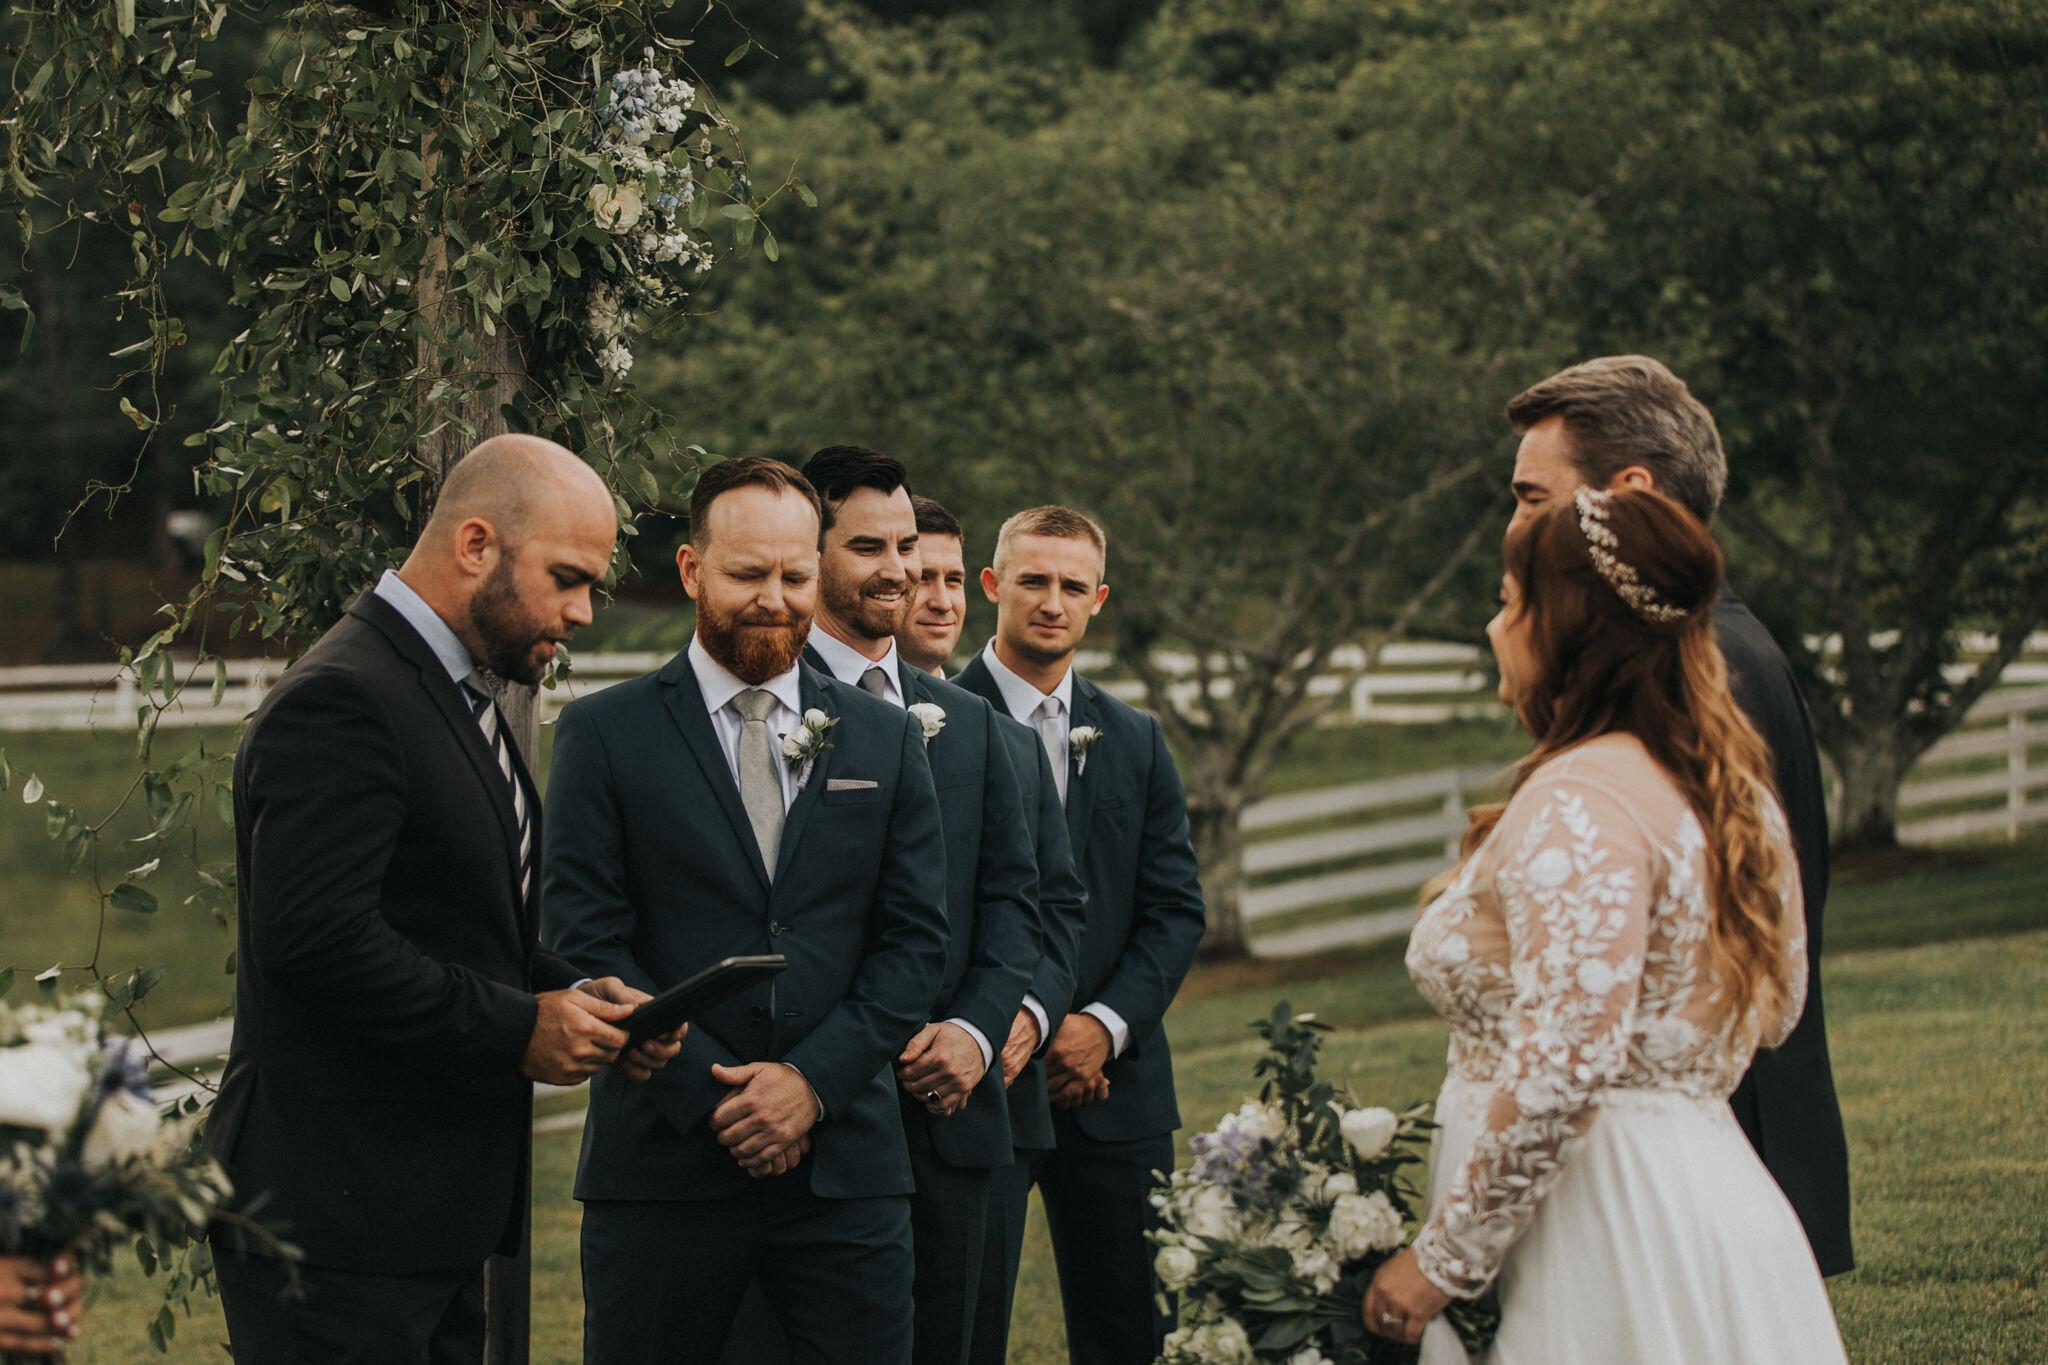 KateMatt-North-Georgia-Wedding-Photographer-Mountain-Laurel-Farm-100.jpg